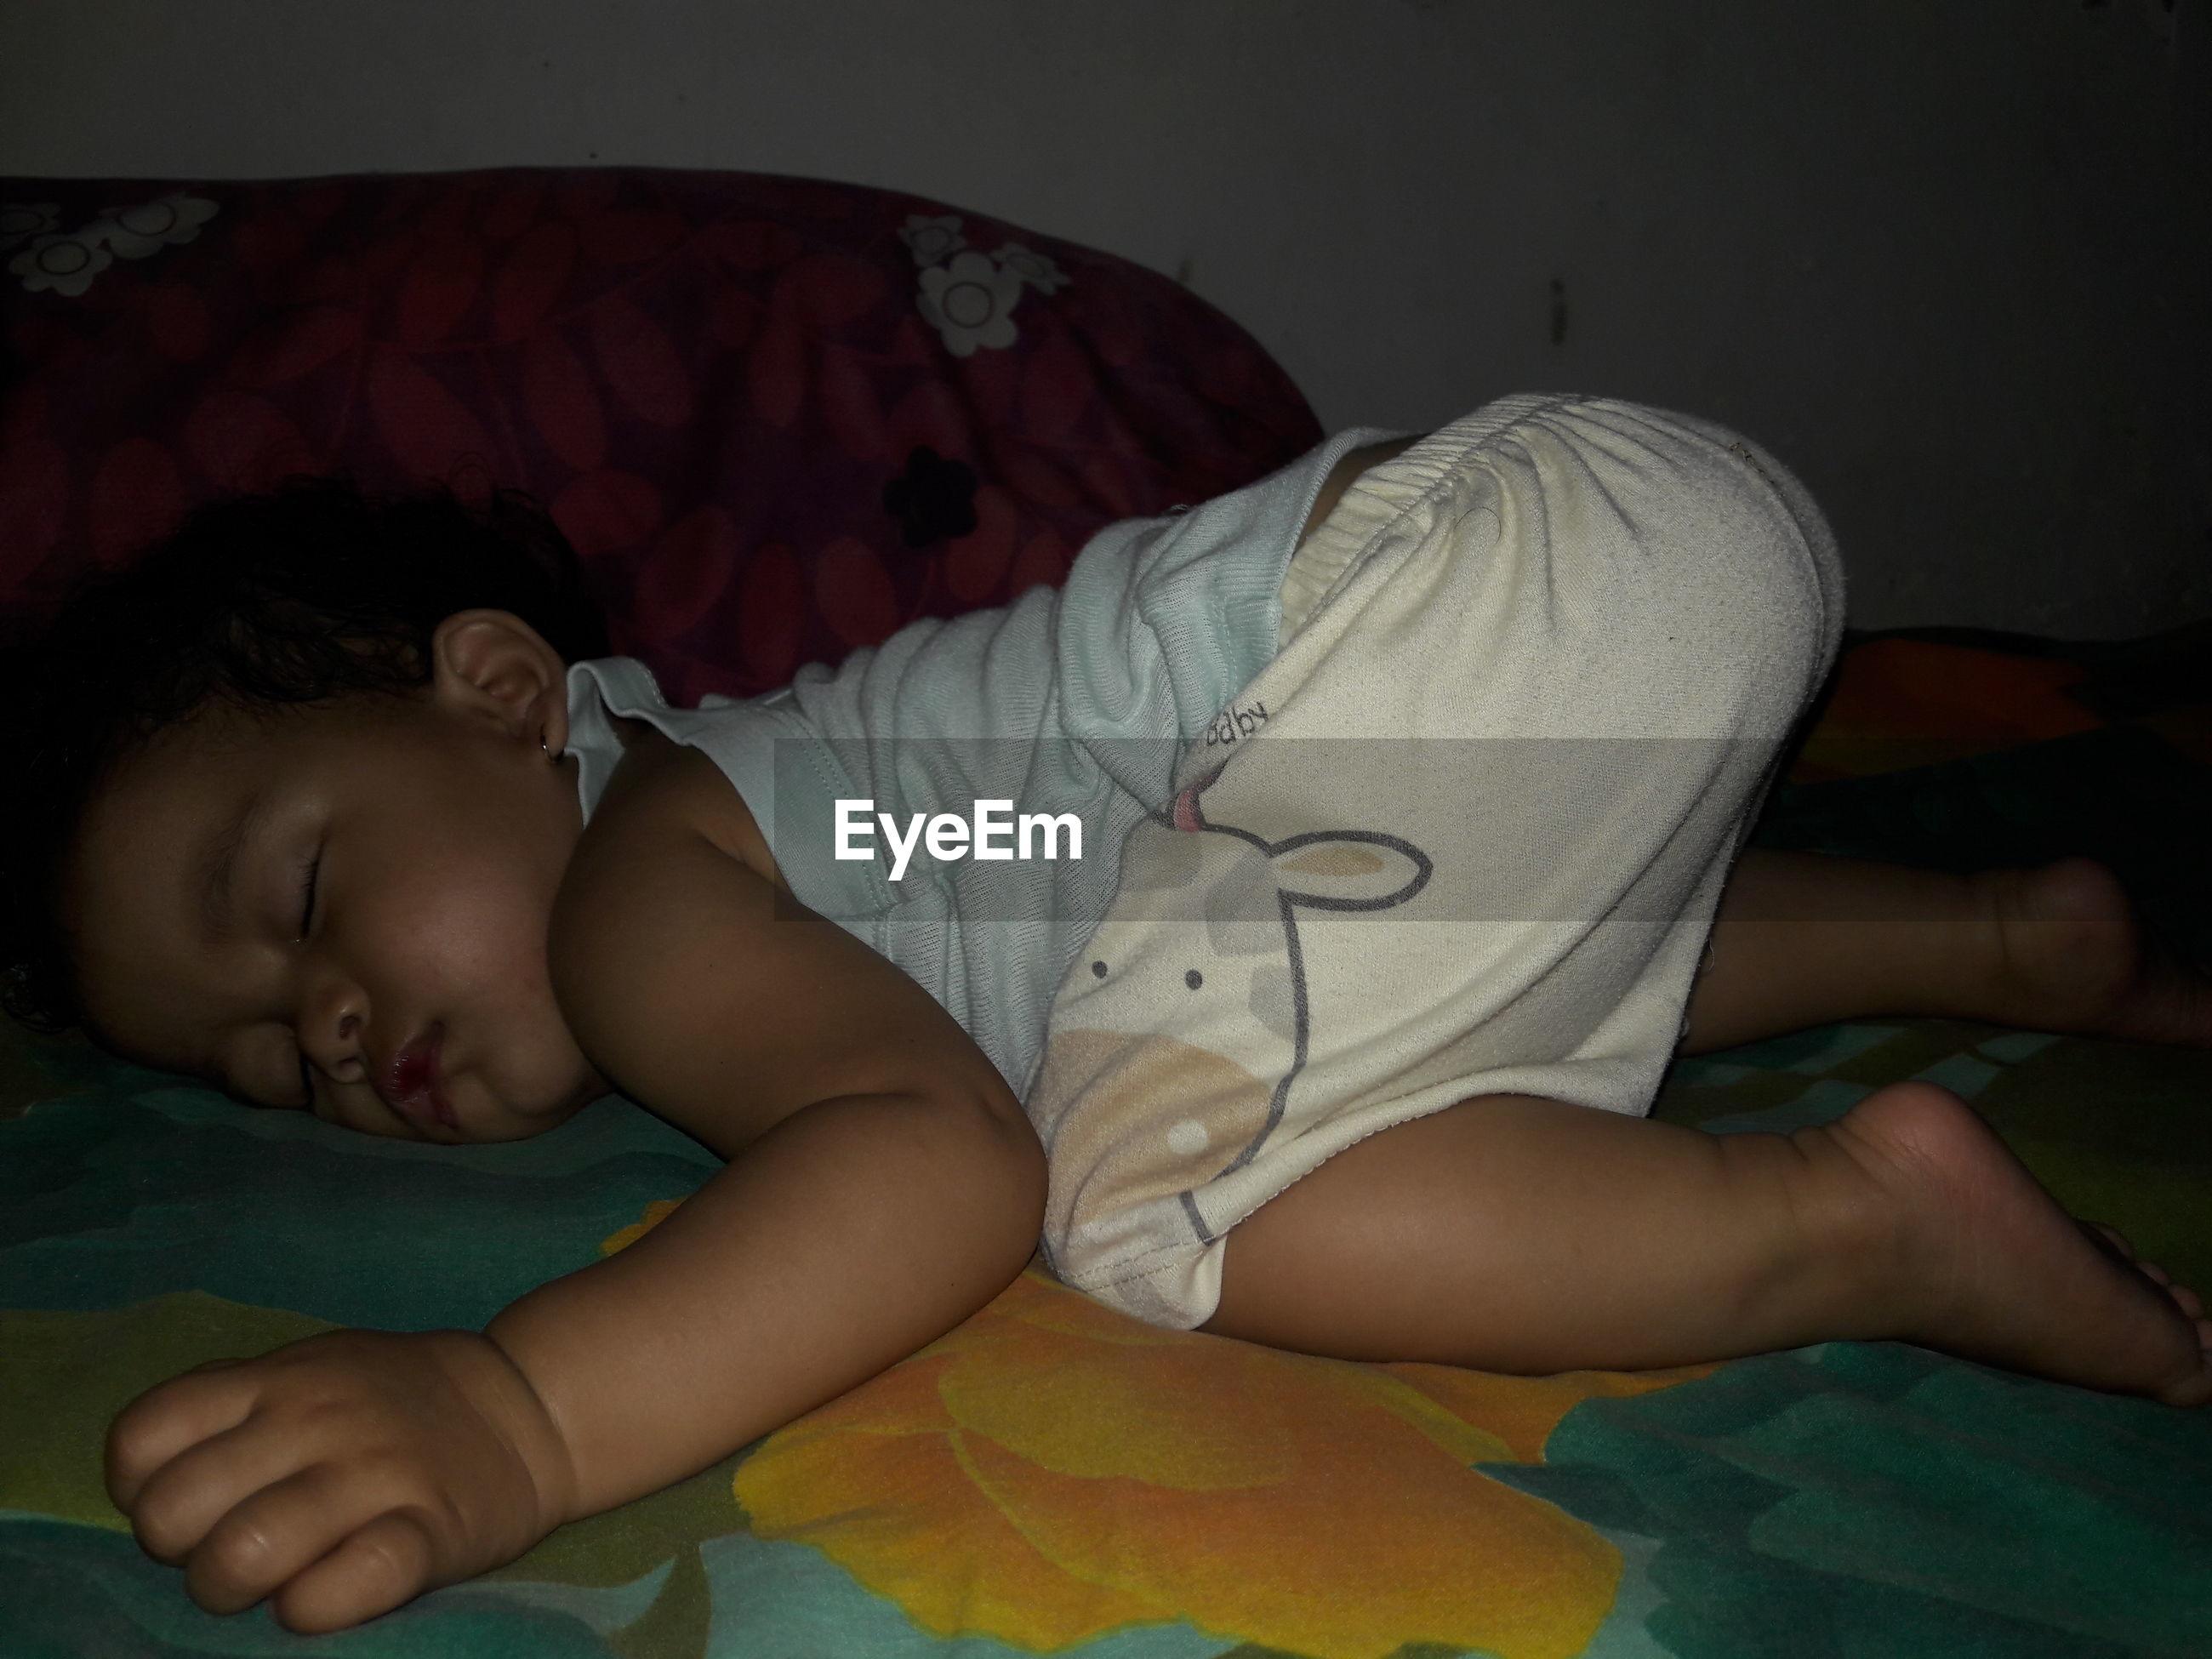 Another sleep